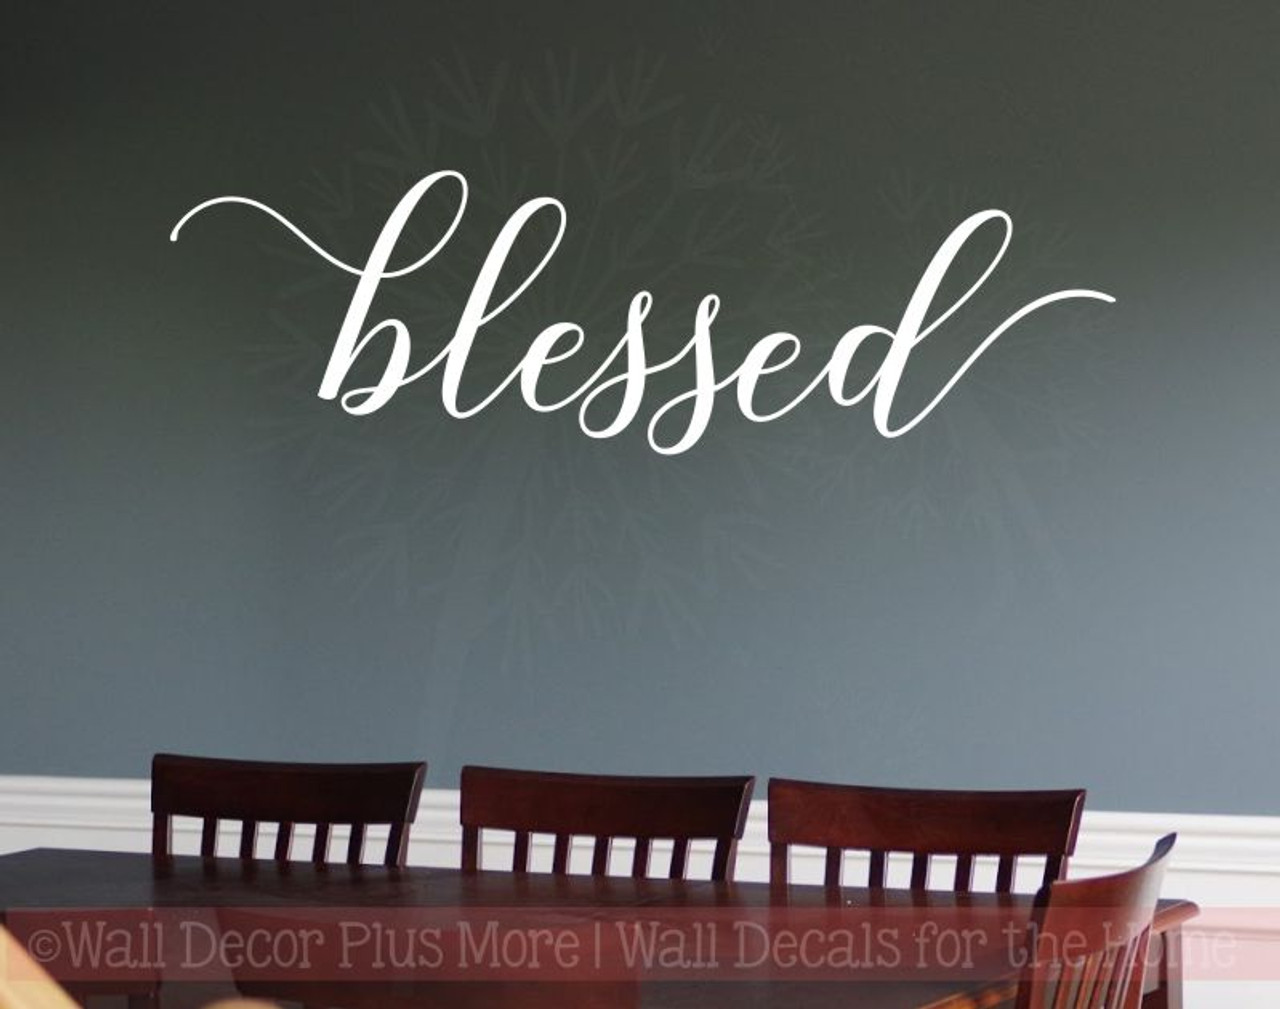 Blessed Cursive Elegant Wall Stickers Decals Vinyl Lettering Kitchen